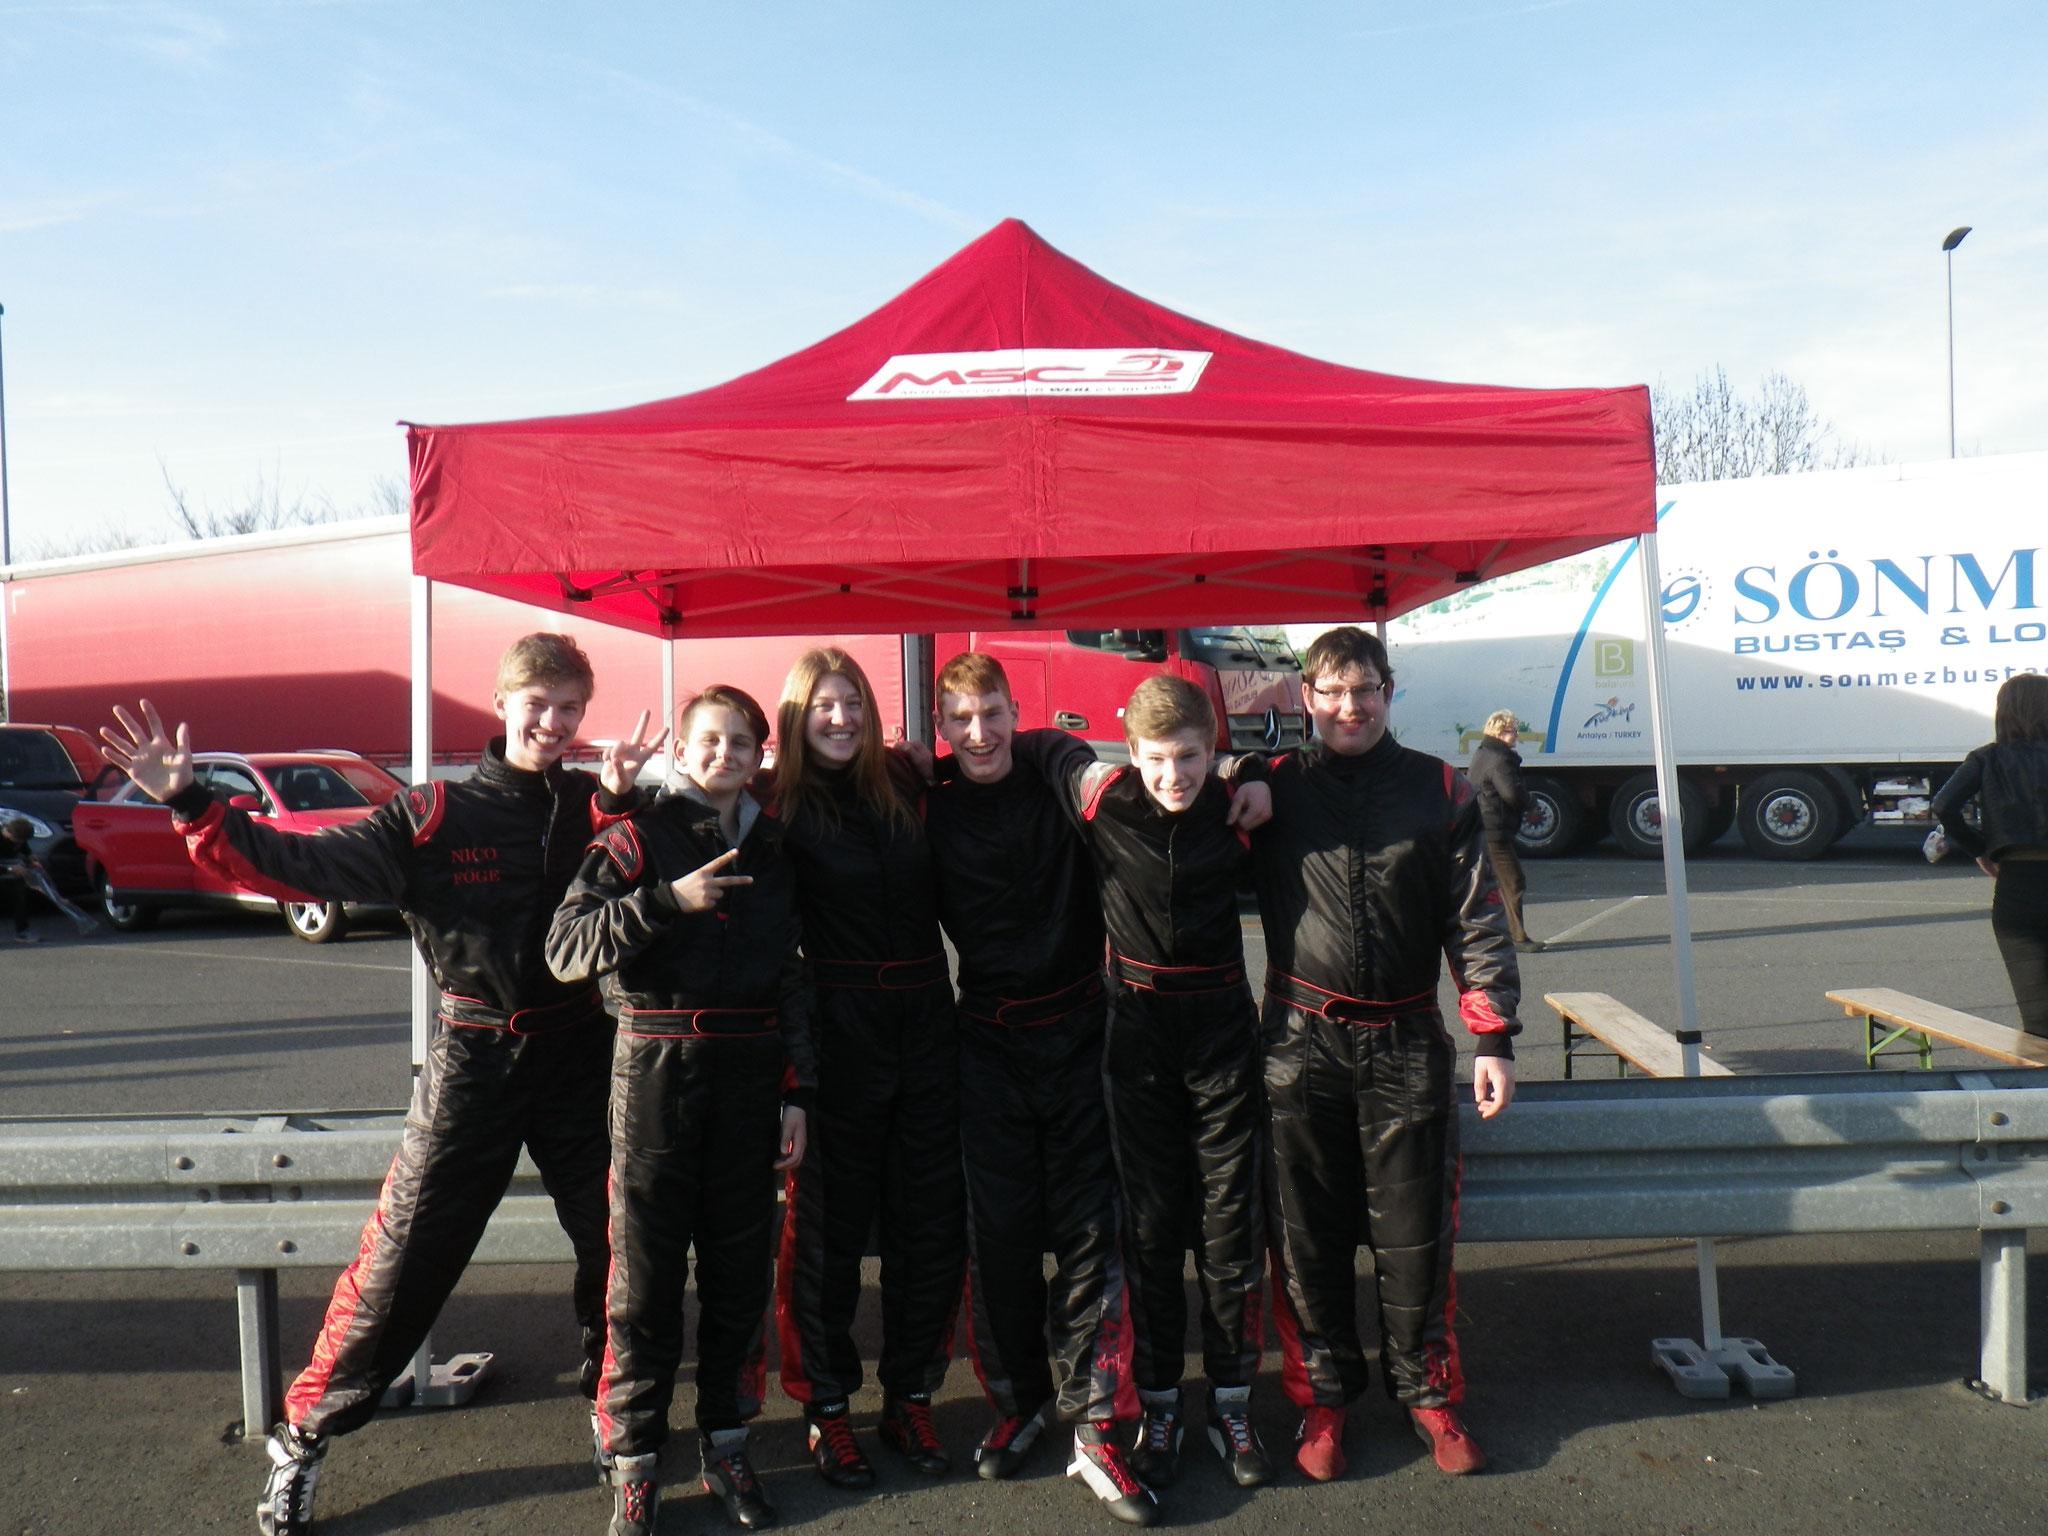 Das komplette Fahrerteam: (v.l.) Nico Föge, Joel Selenski, Janica Schlüer, Tjark Schlüer, Michel Boje und Alexander Doll